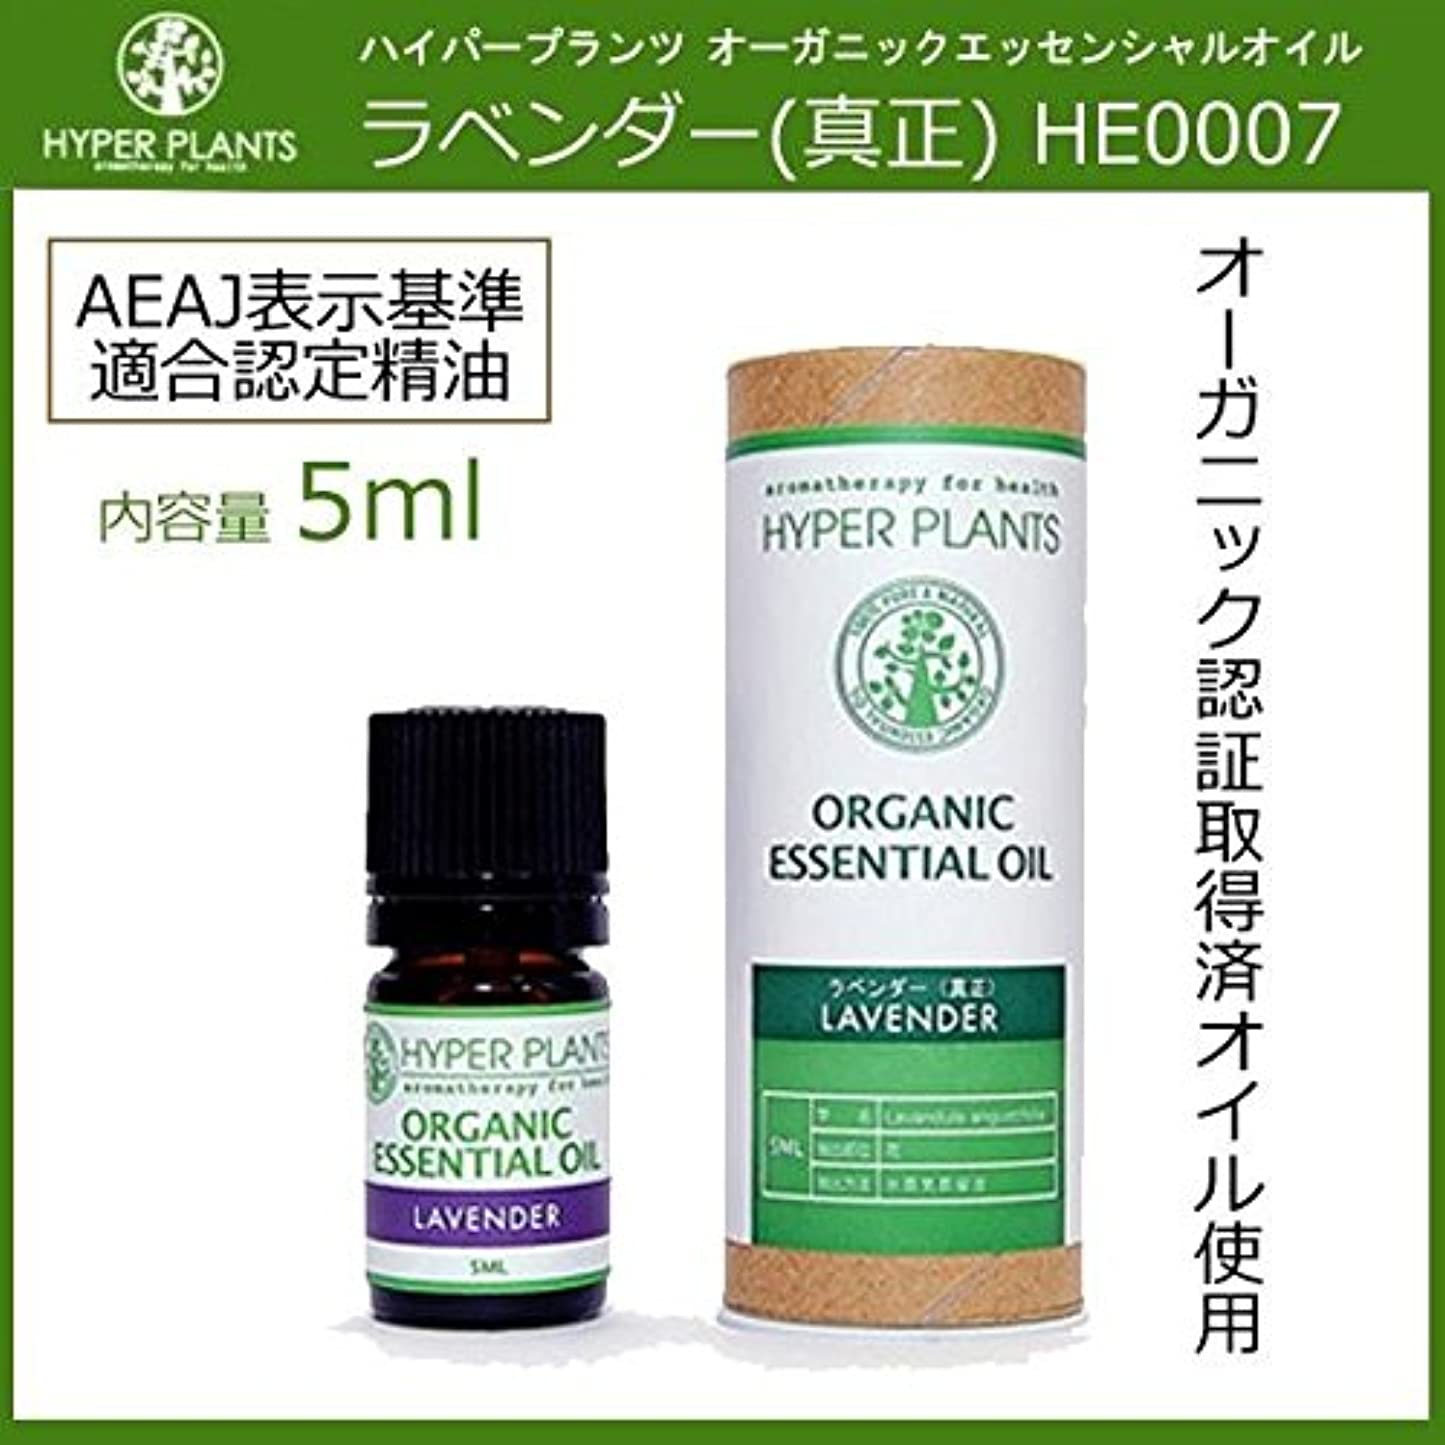 HYPER PLANTS ハイパープランツ オーガニックエッセンシャルオイル ラベンダー(真正) 5ml HE0007